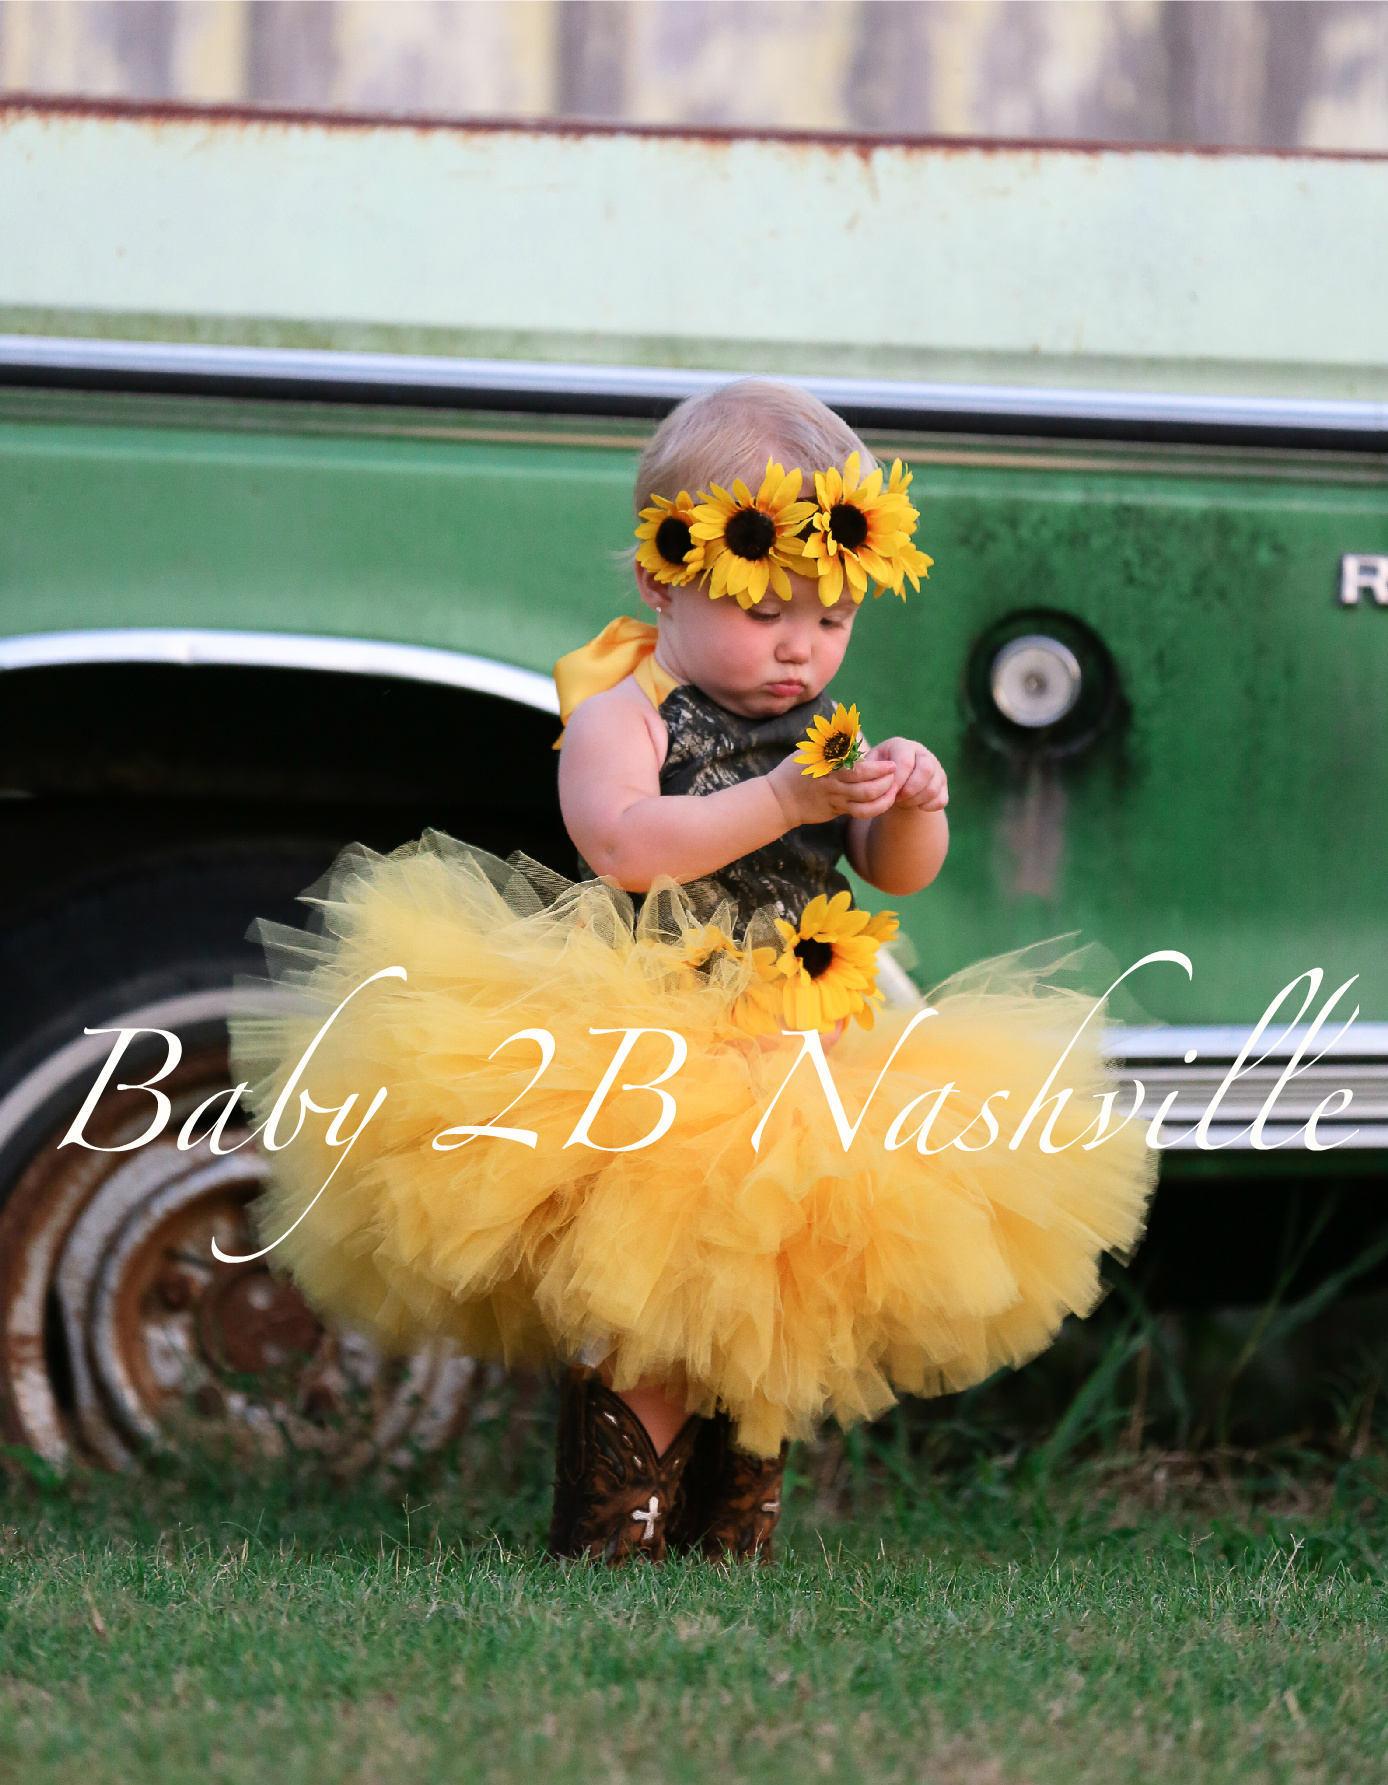 Camo dress yellow sunflower dress flower girl dress wedding dress camo dress yellow sunflower dress flower girl dress wedding dress mossy oak tutu dress baby dress toddler dress tulle dress girls dress mightylinksfo